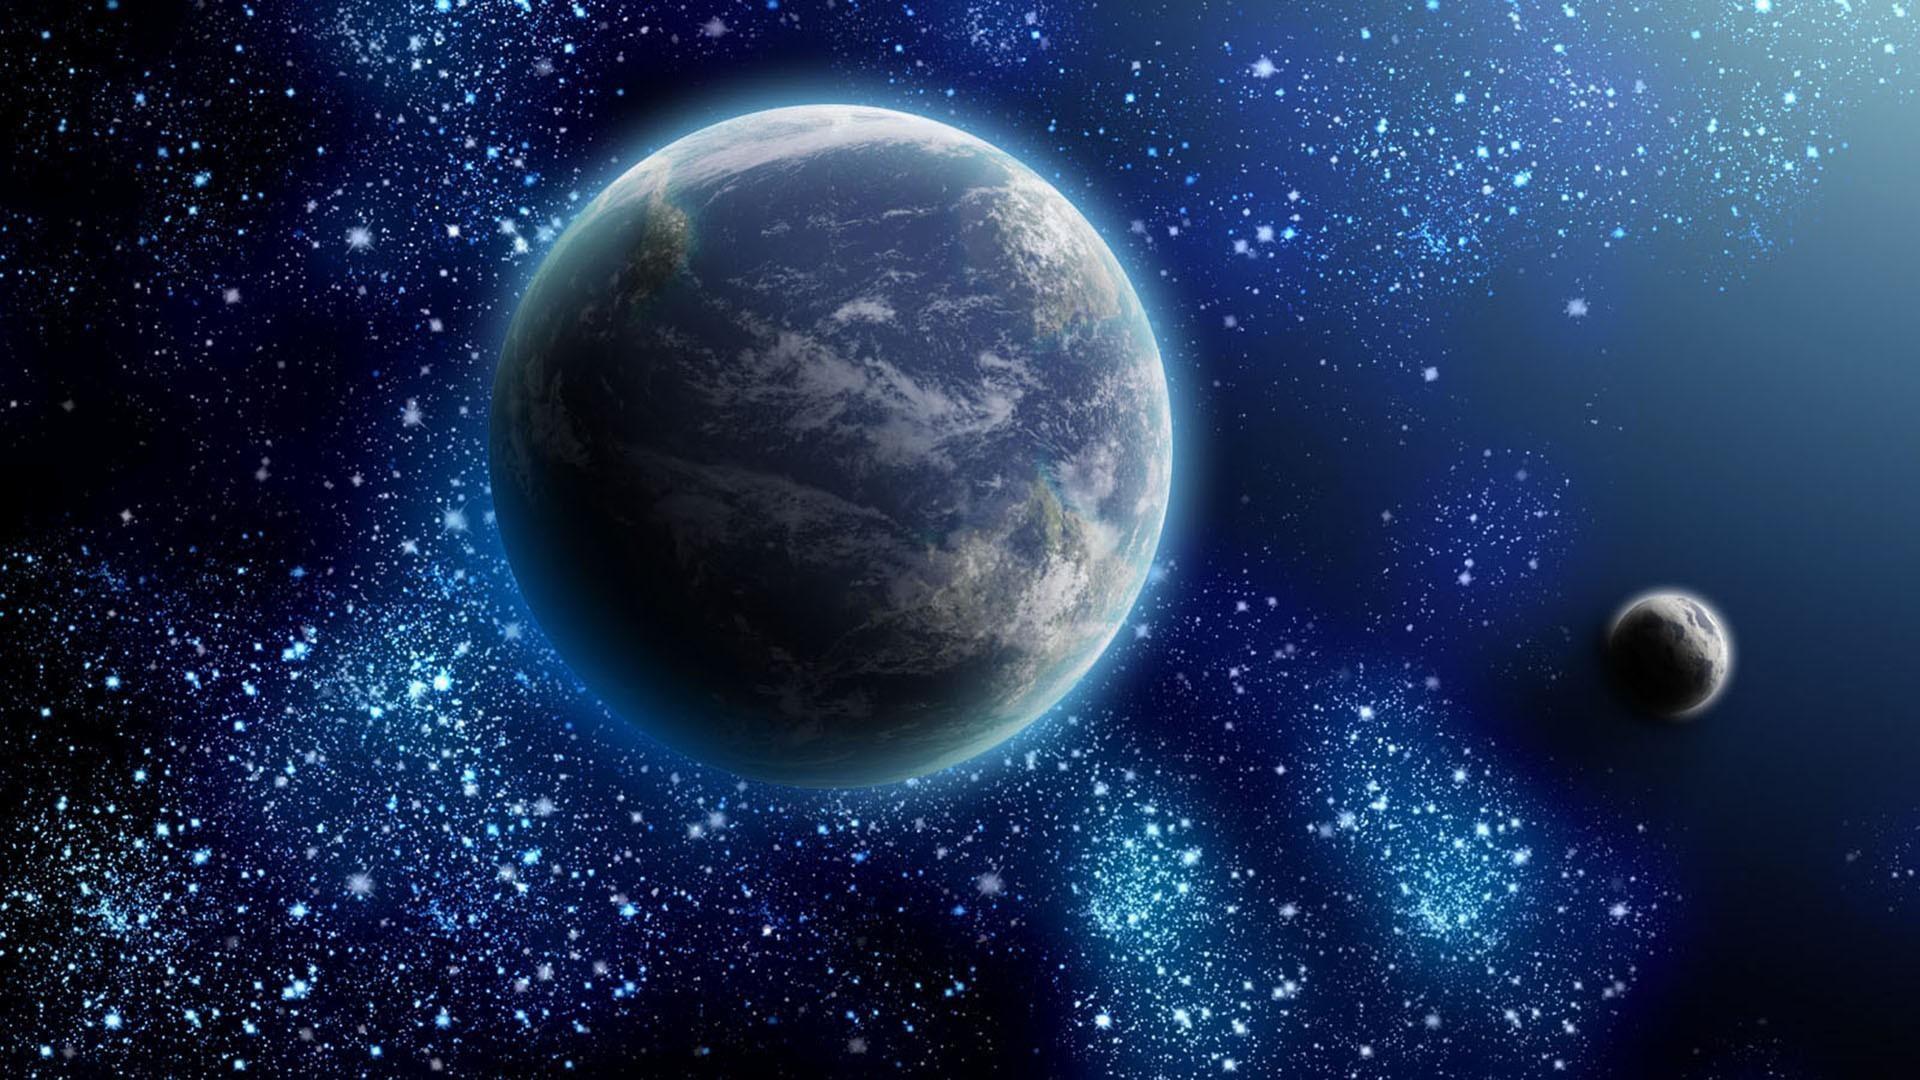 wallpaper.wiki-HD-Sun-Moon-Stars-Wallpaper-Free-